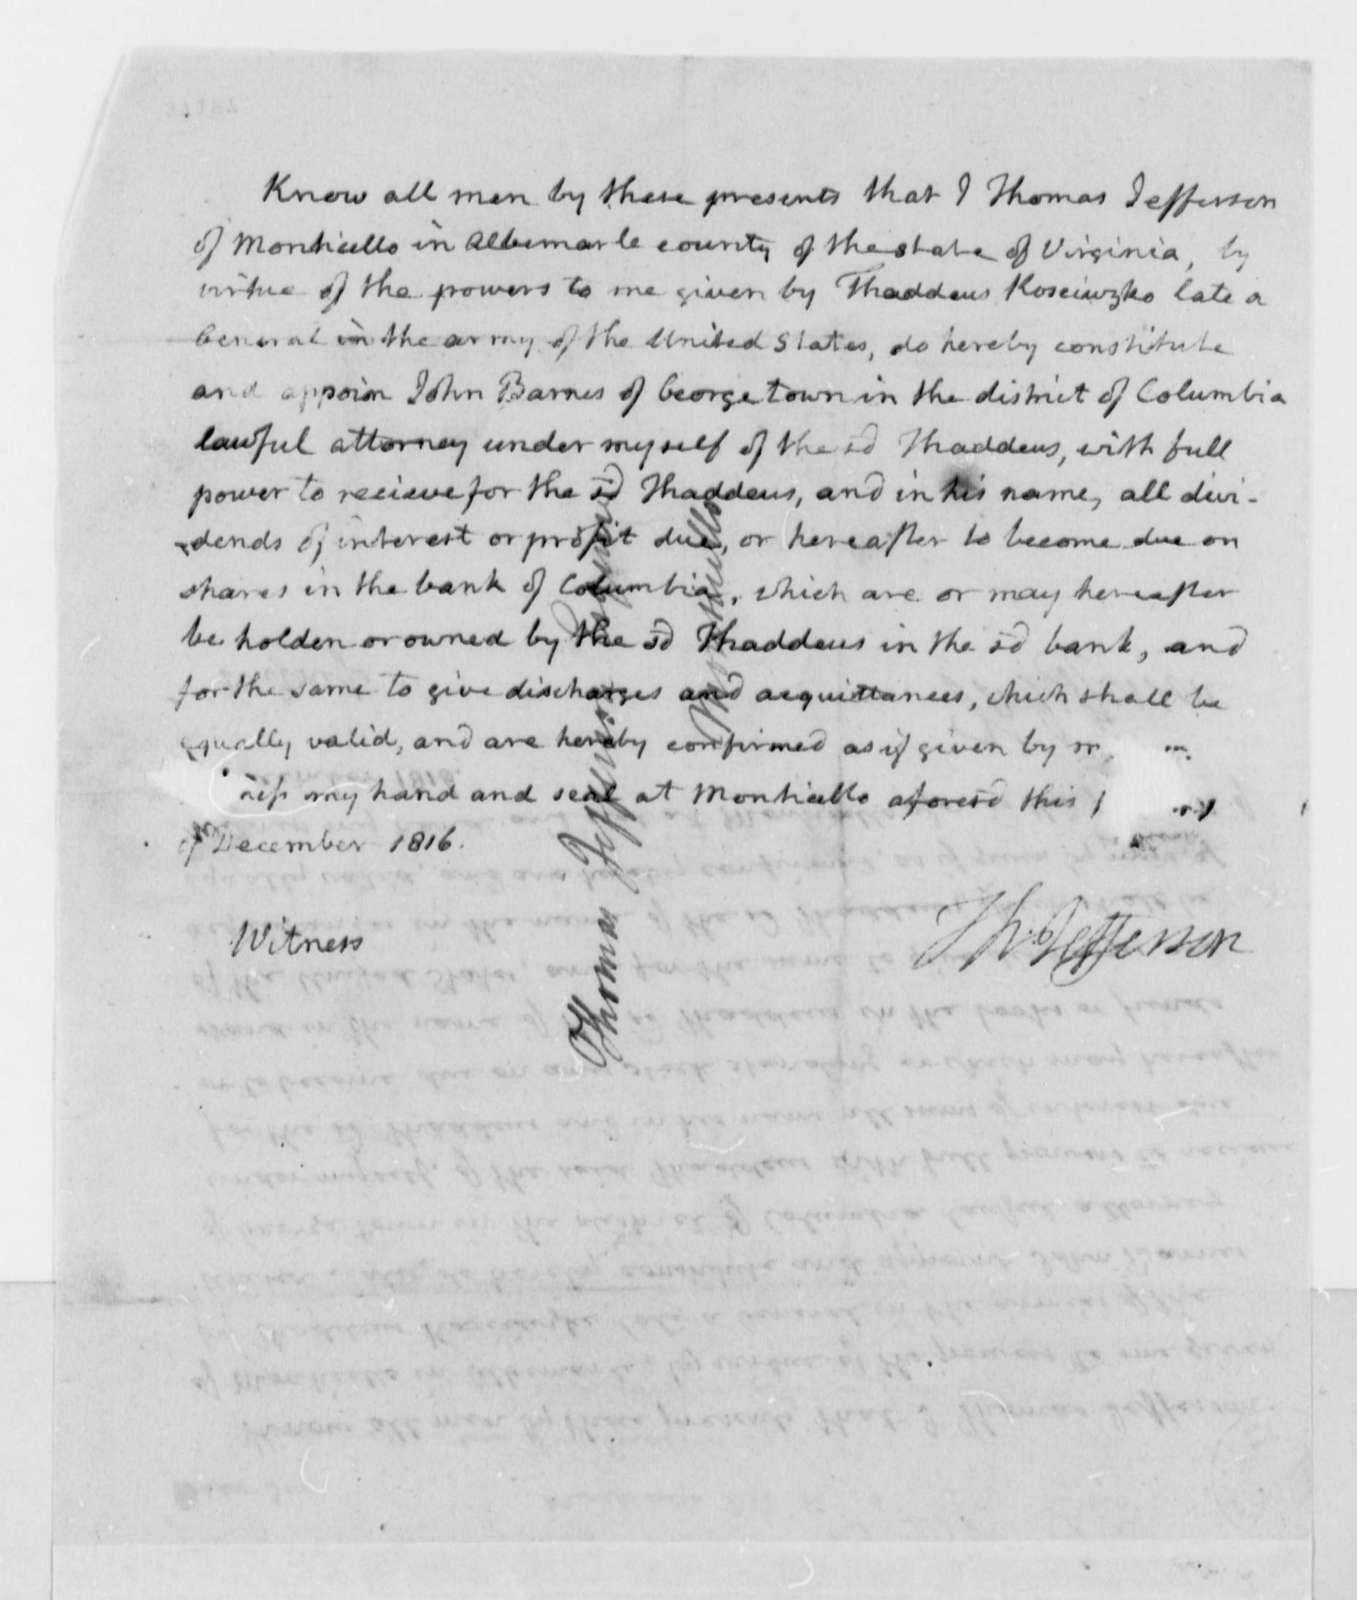 Thomas Jefferson to John S. Barnes, December 15, 1816, with Barnes Powers of Attorney